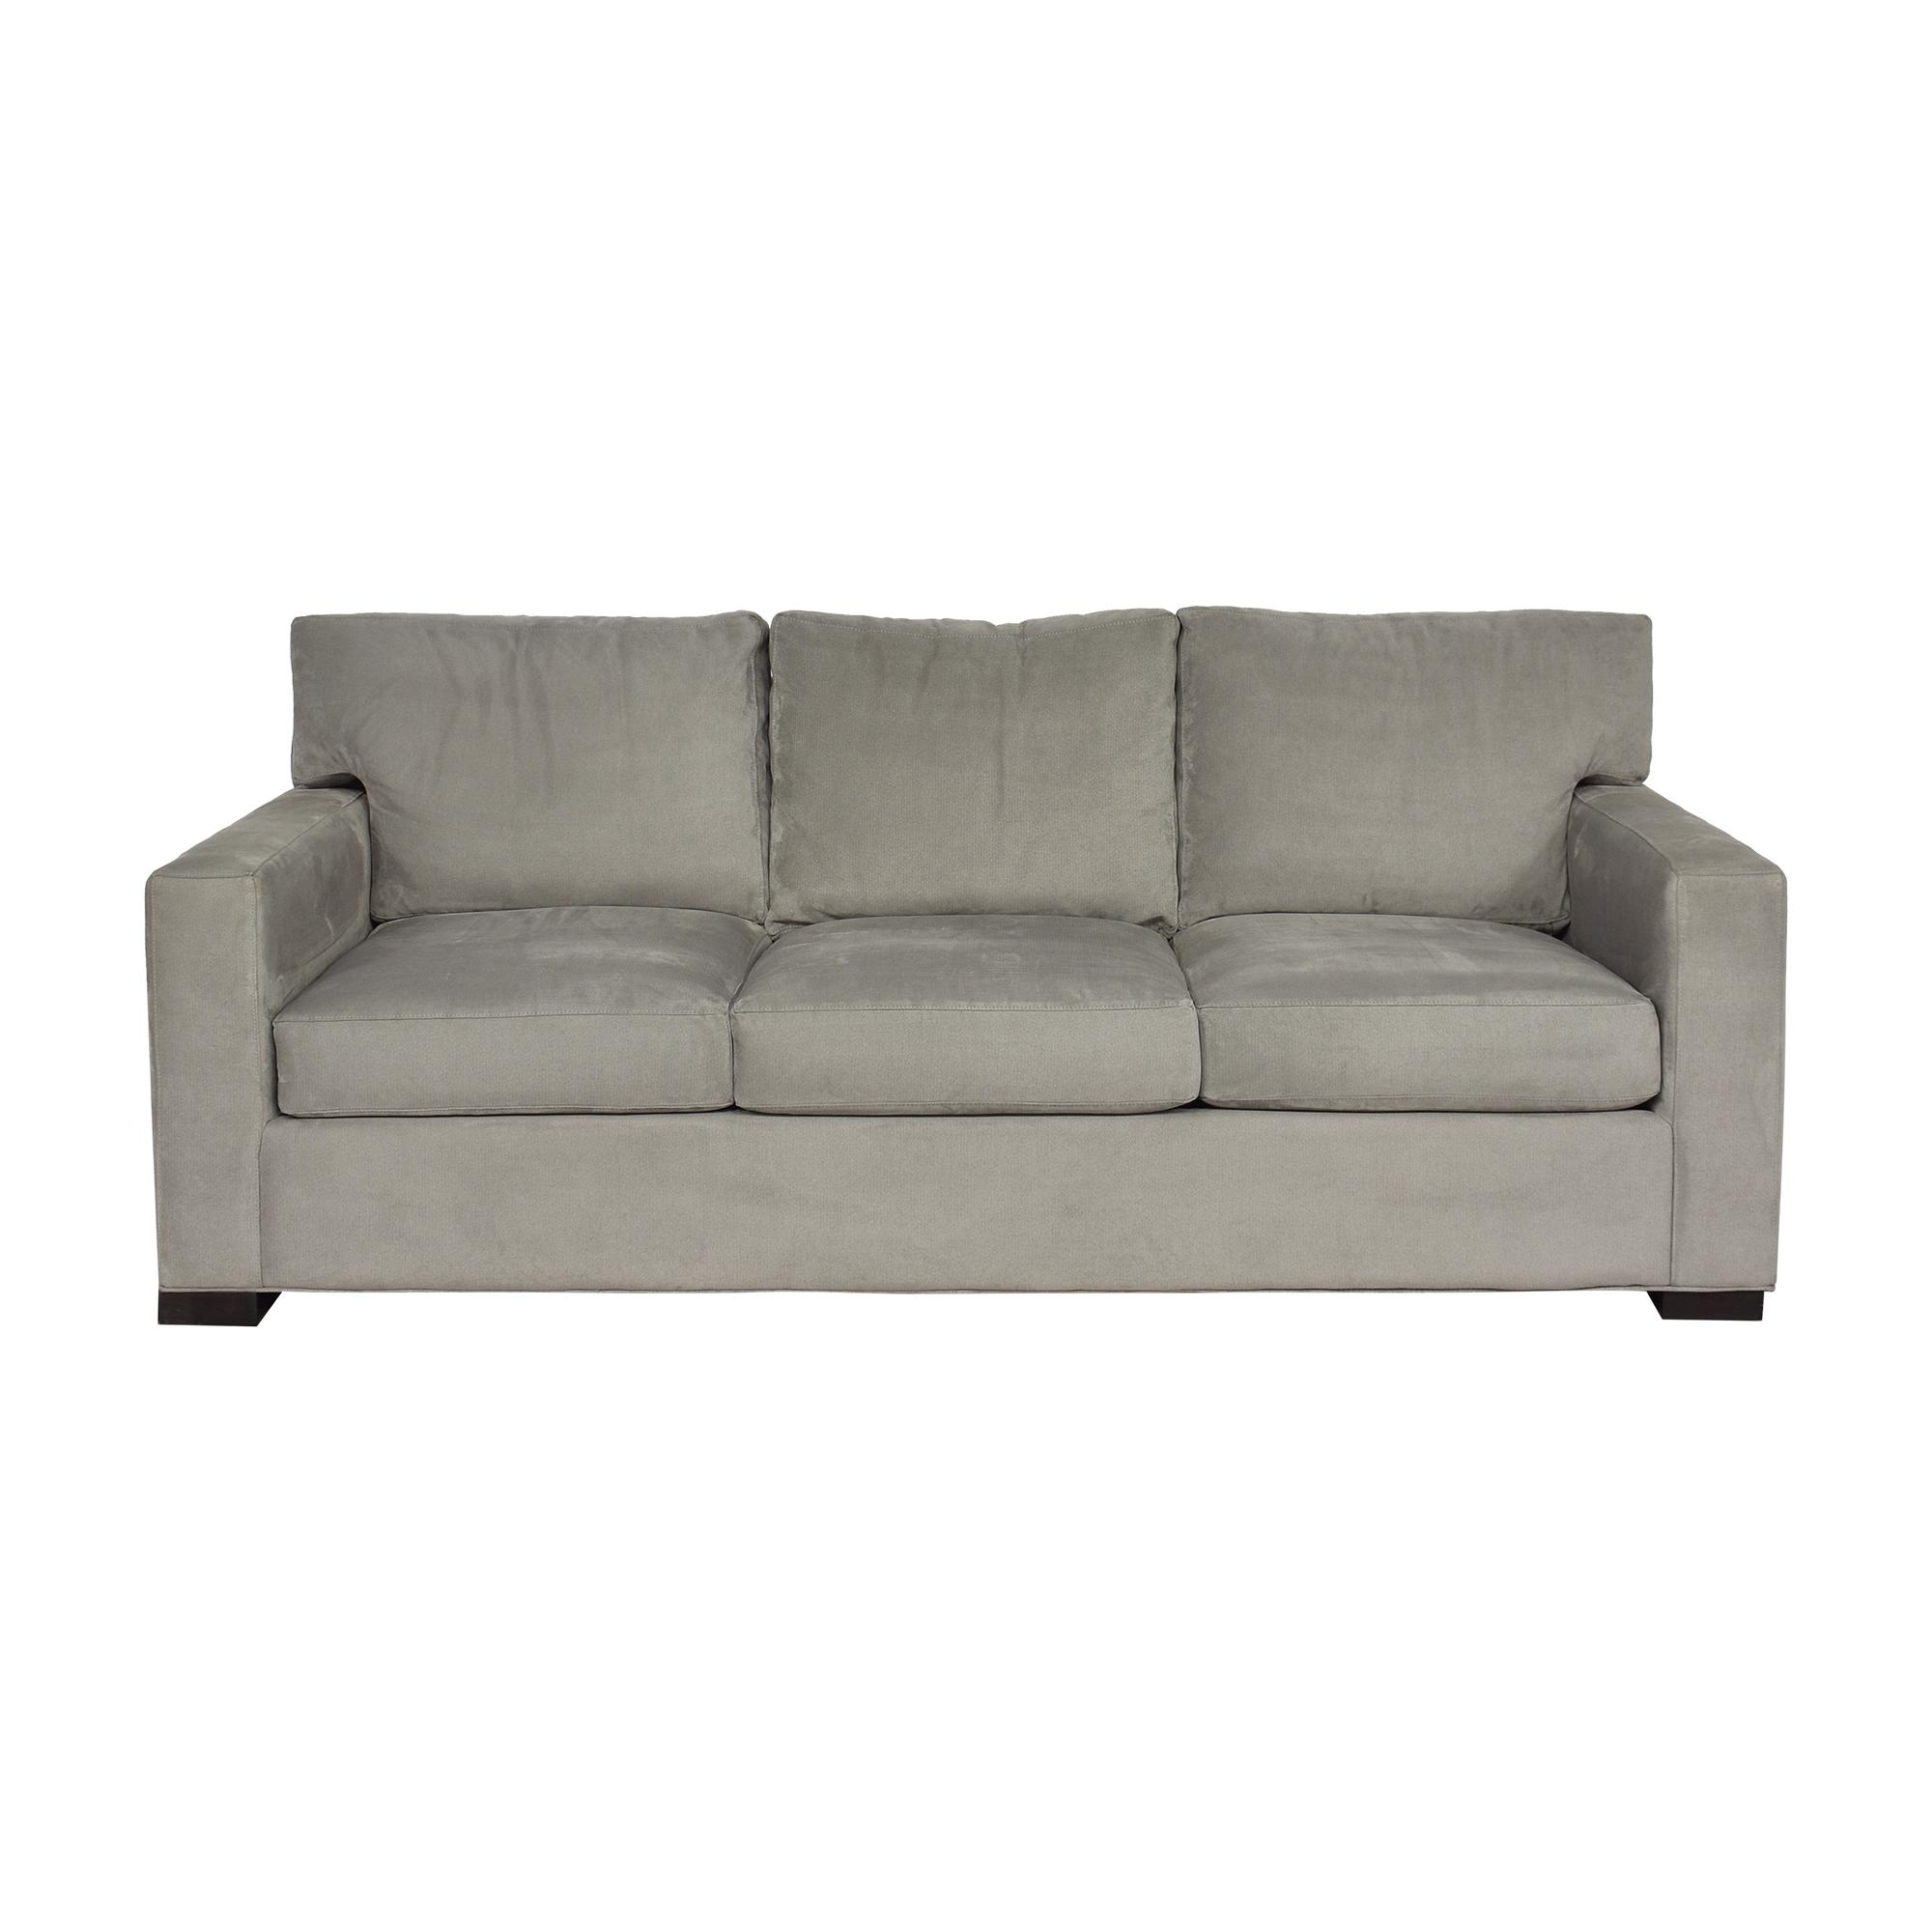 Crate & Barrel Axis Three-Seat Sofa / Classic Sofas